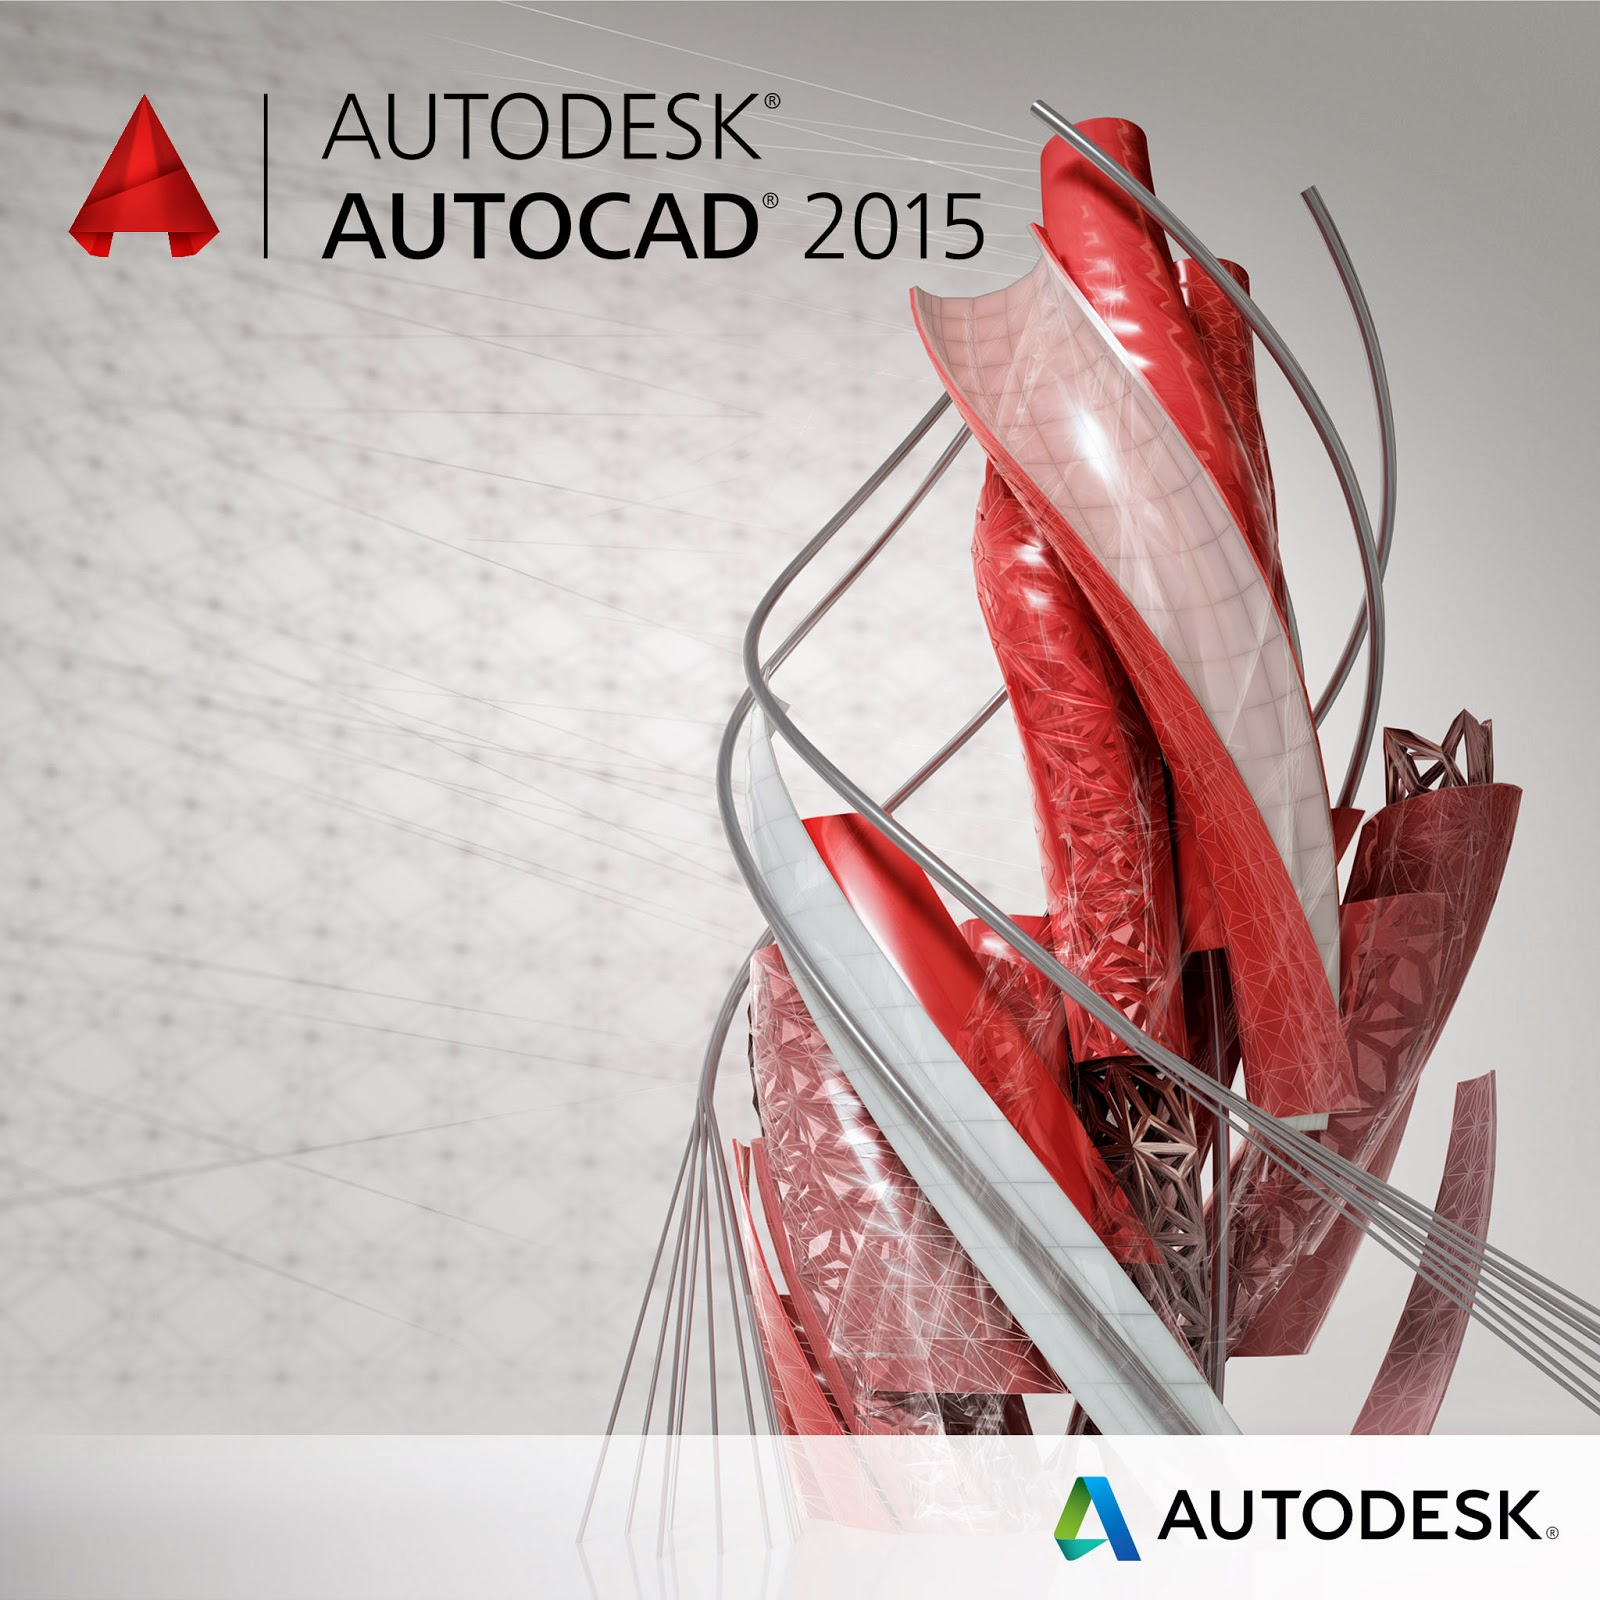 Autocad 2015 Product Key Crack Keygen Download Free Full